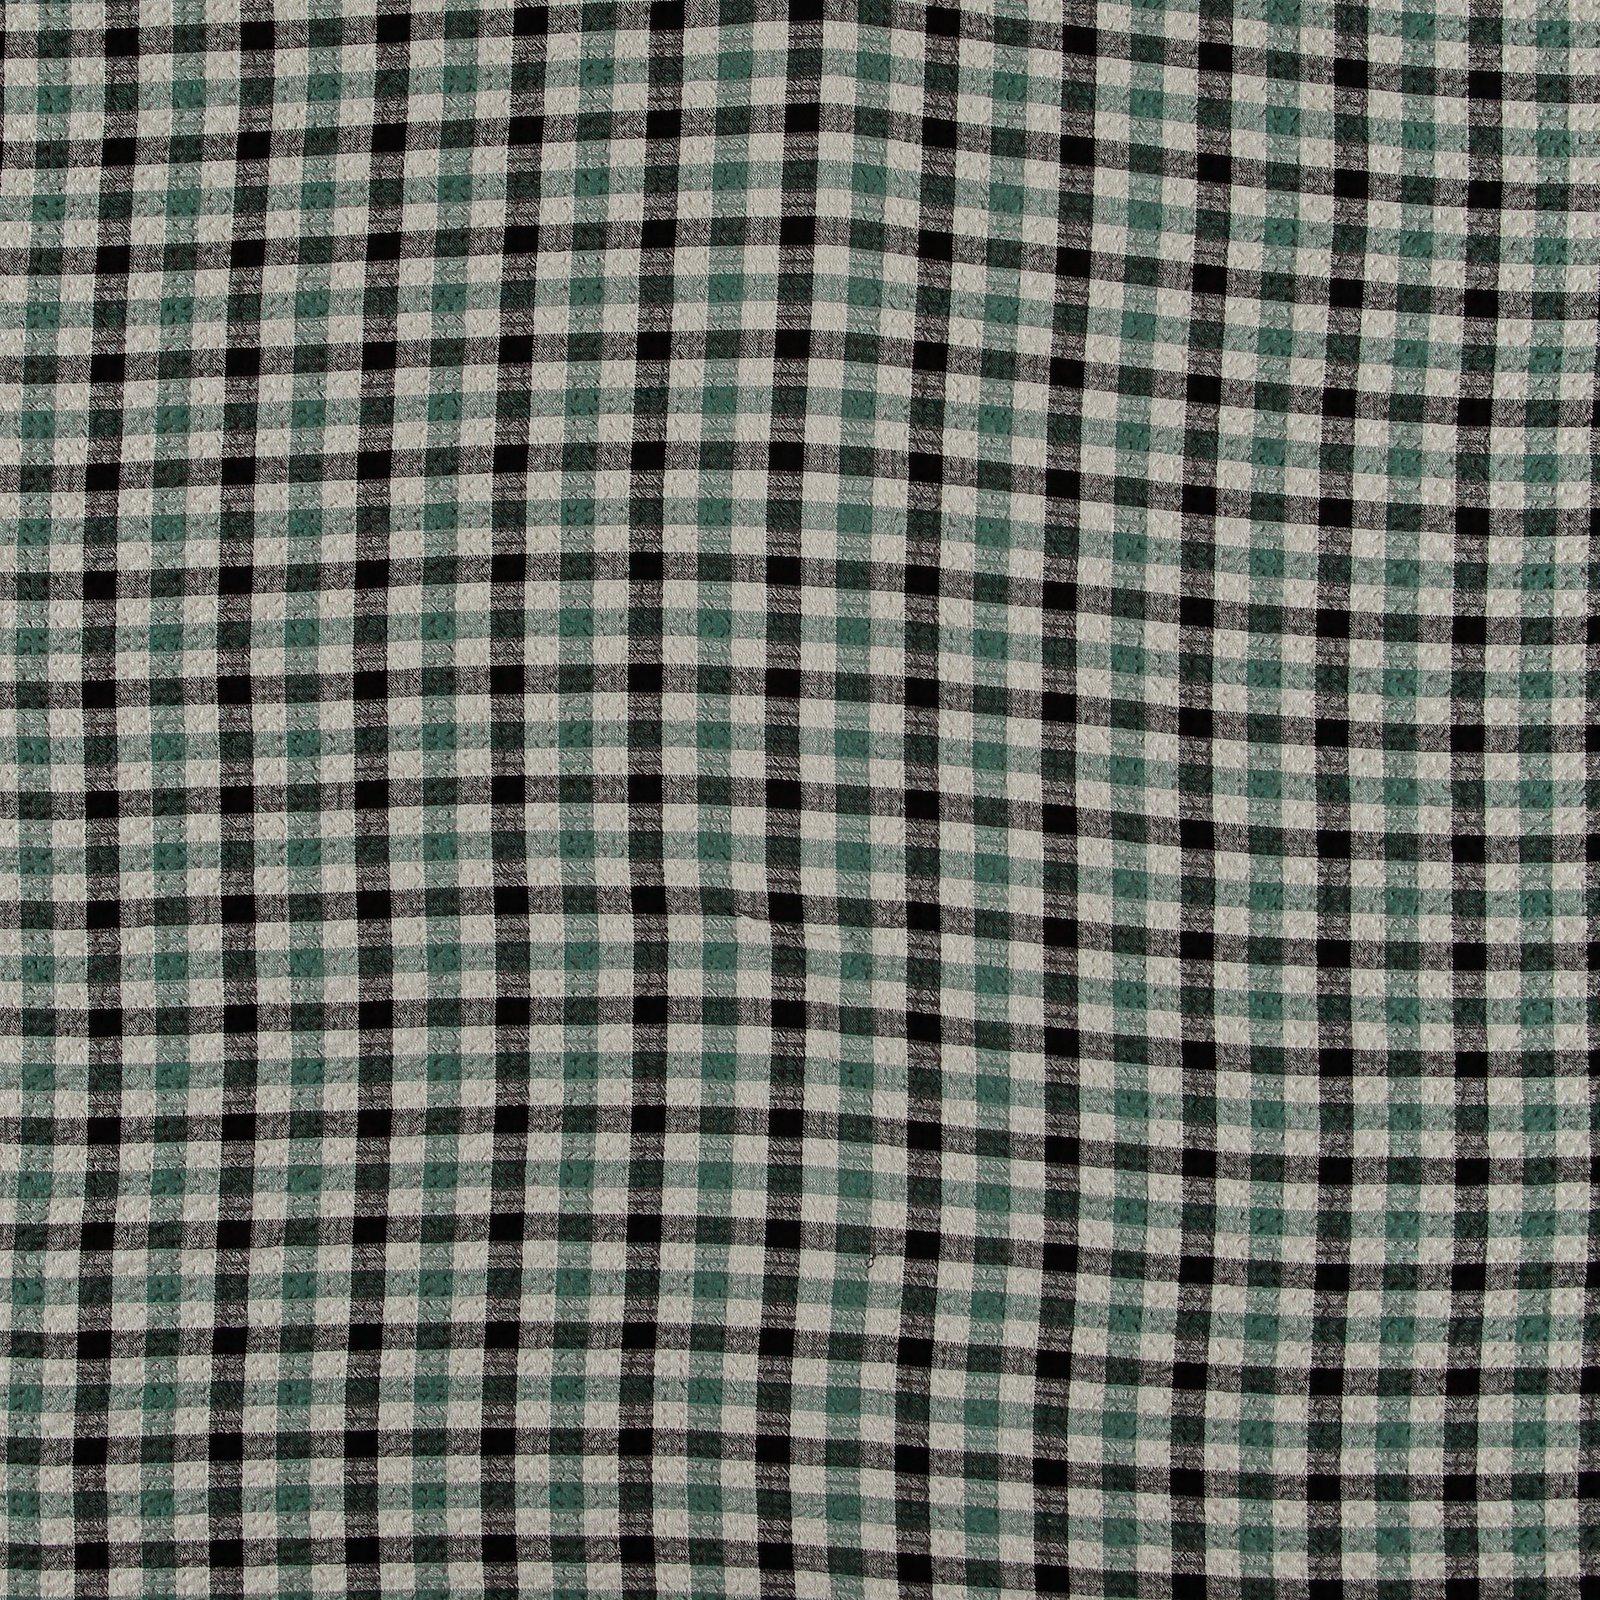 Viskose gewebt mit Struktur, Grün/Offwh. 701096_pack_sp